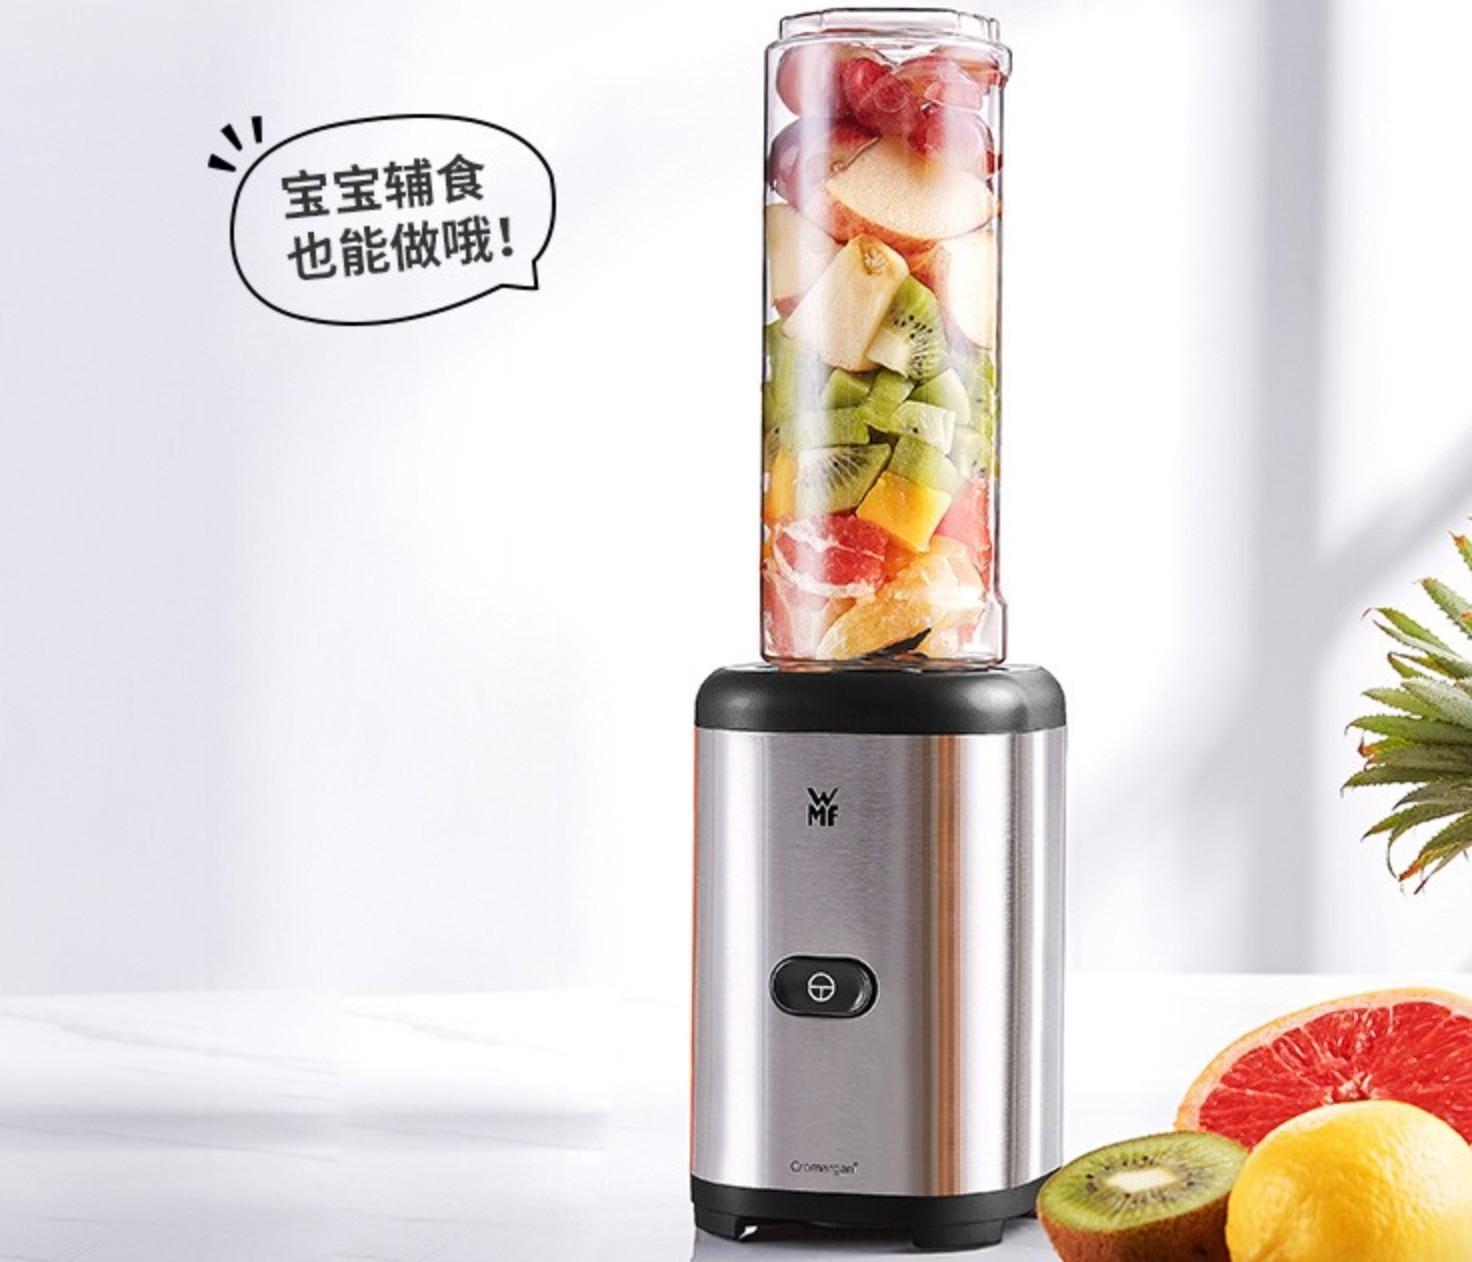 WMF/福腾宝 便捷快速出汁 榨汁杯